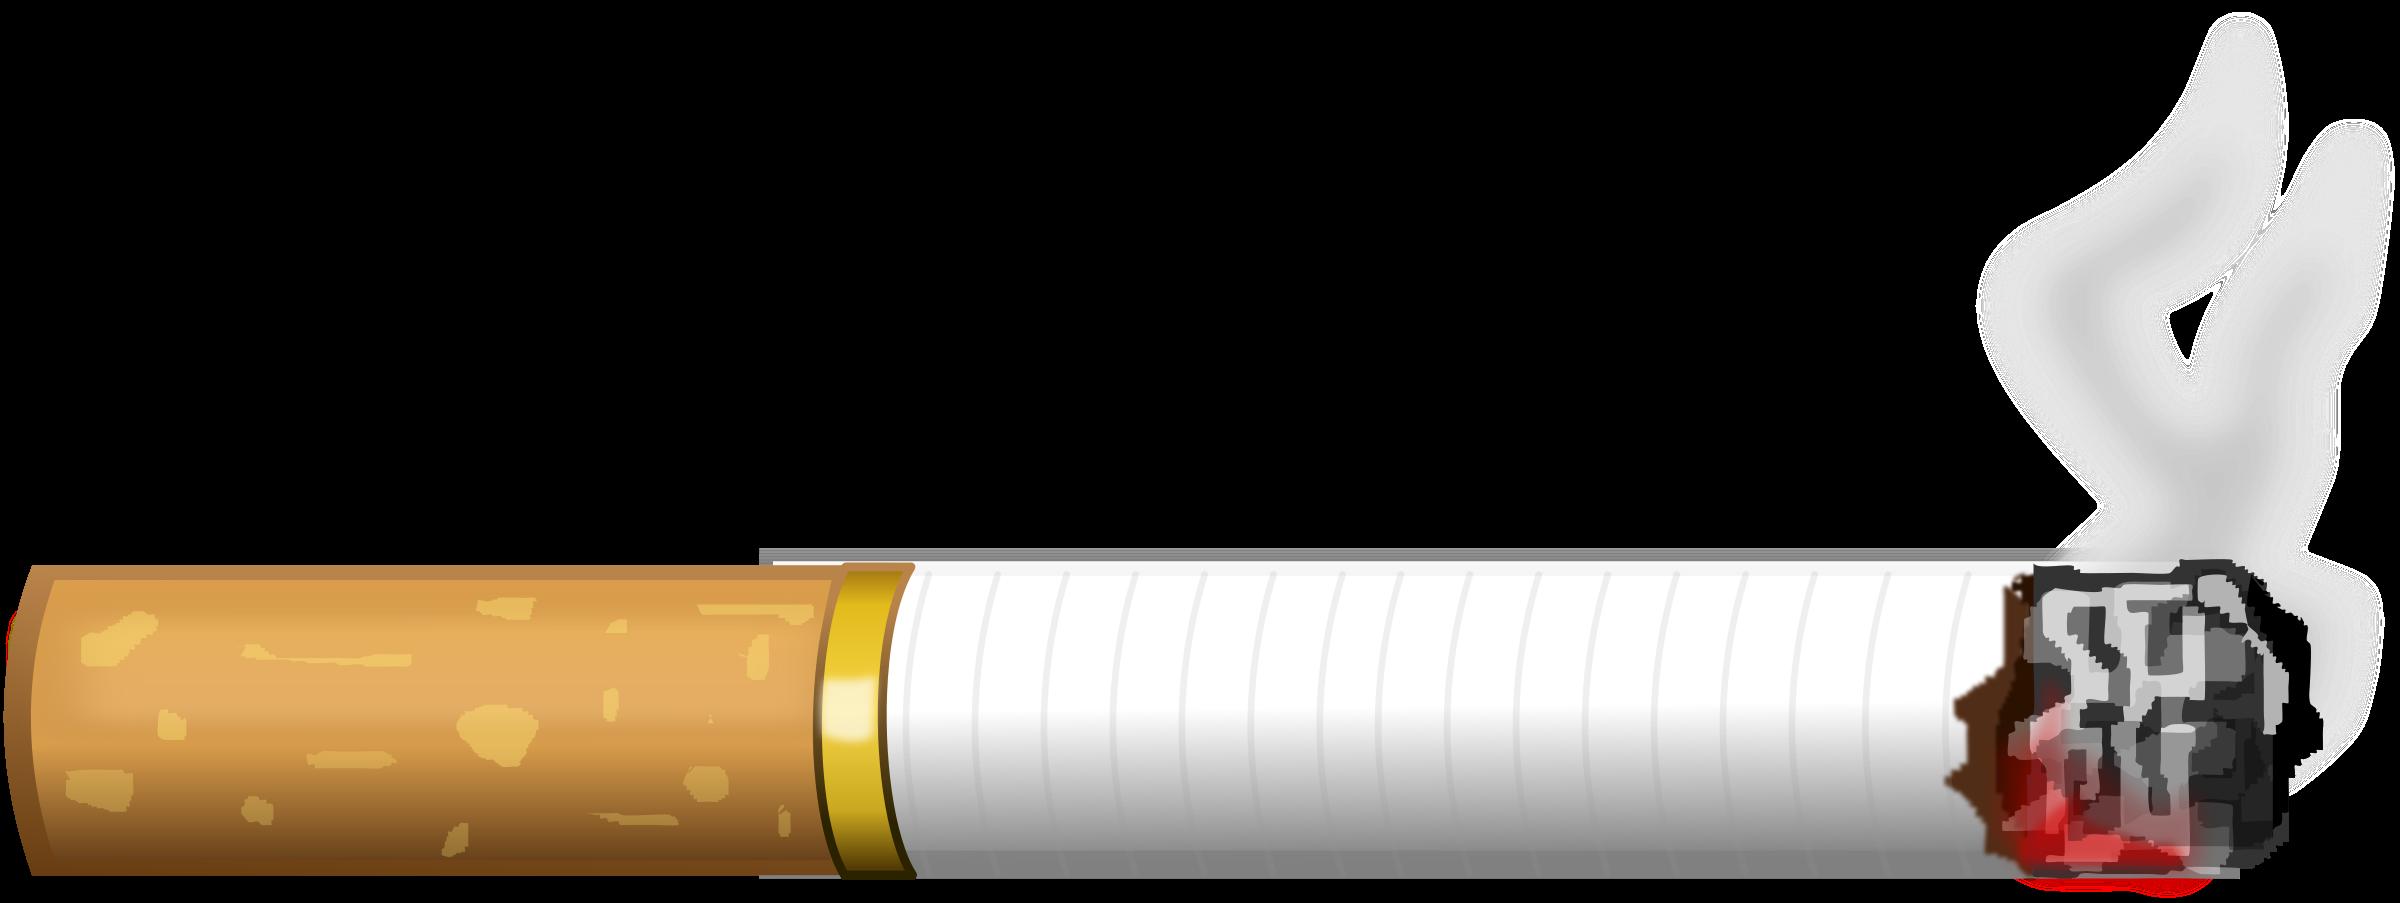 Clipart Cigarette Smoking.